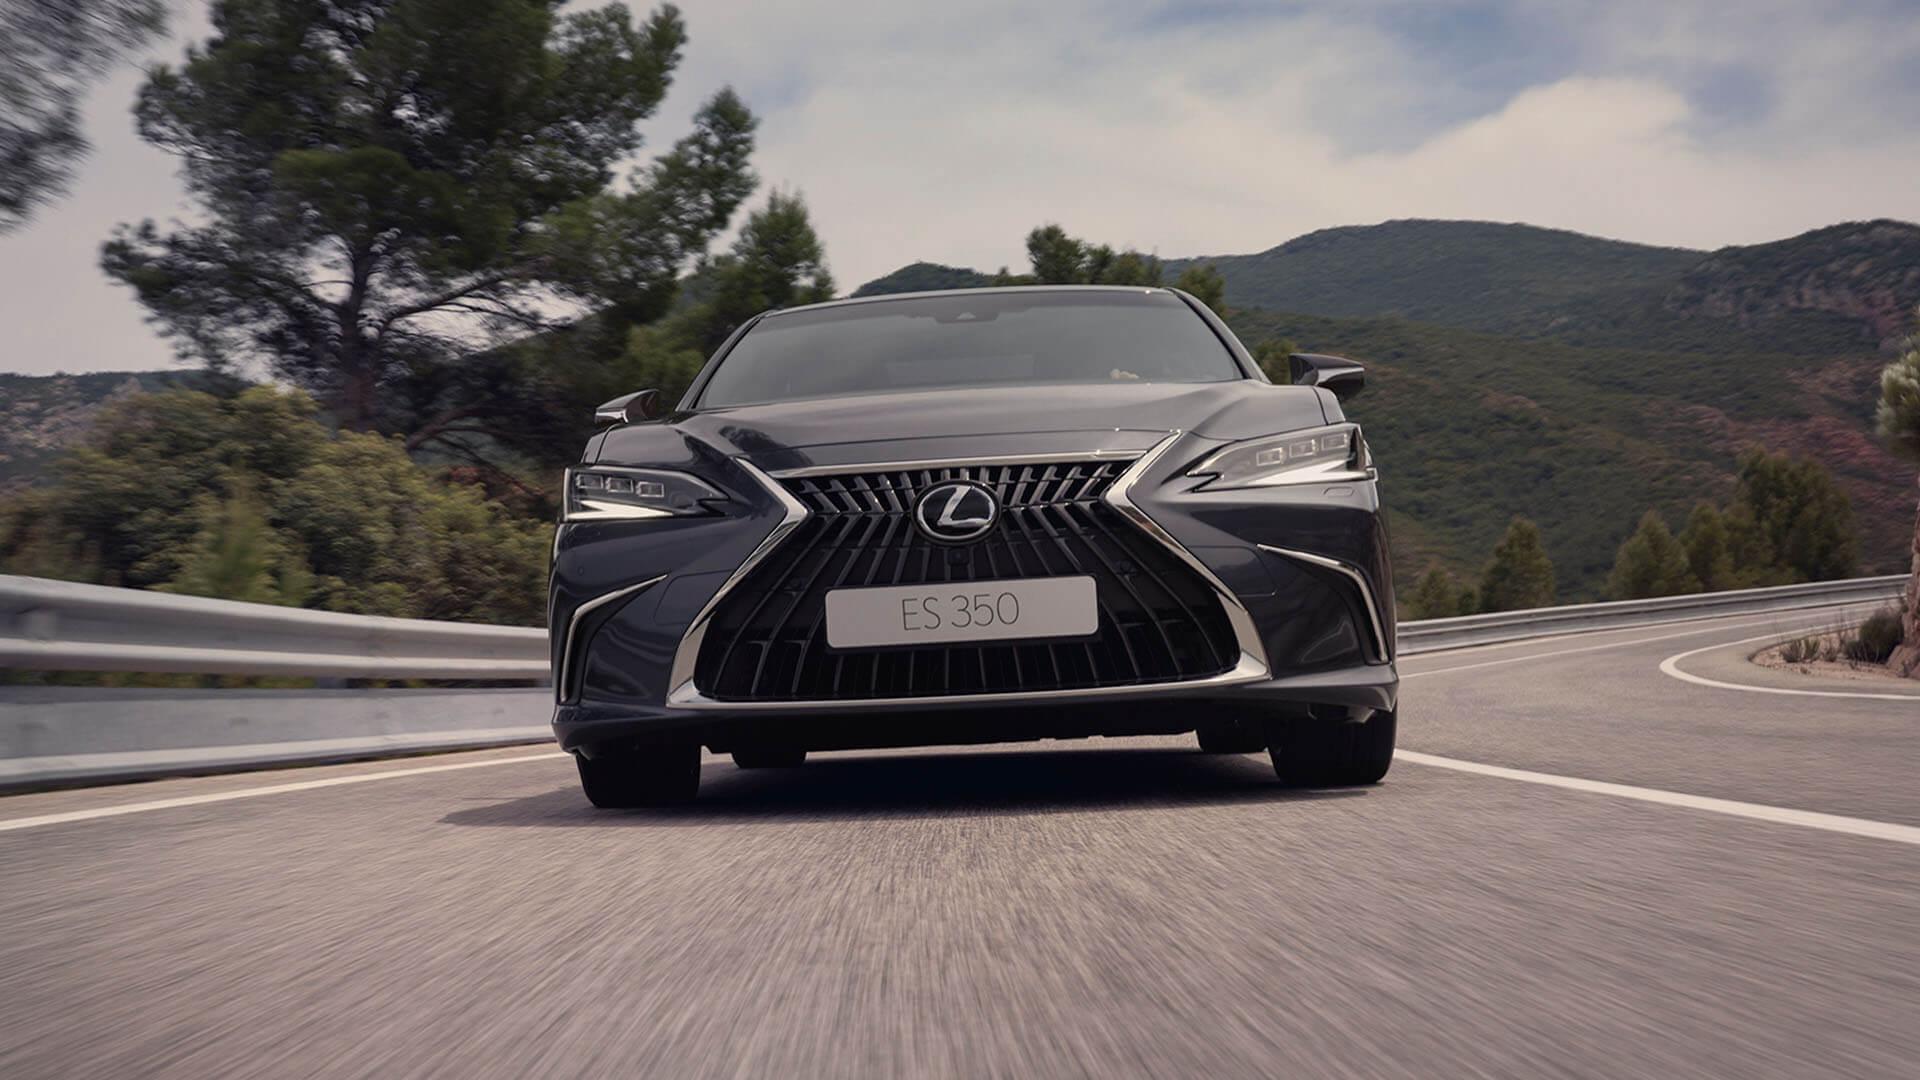 2022 RU lexus es experience exterior front new led headlights